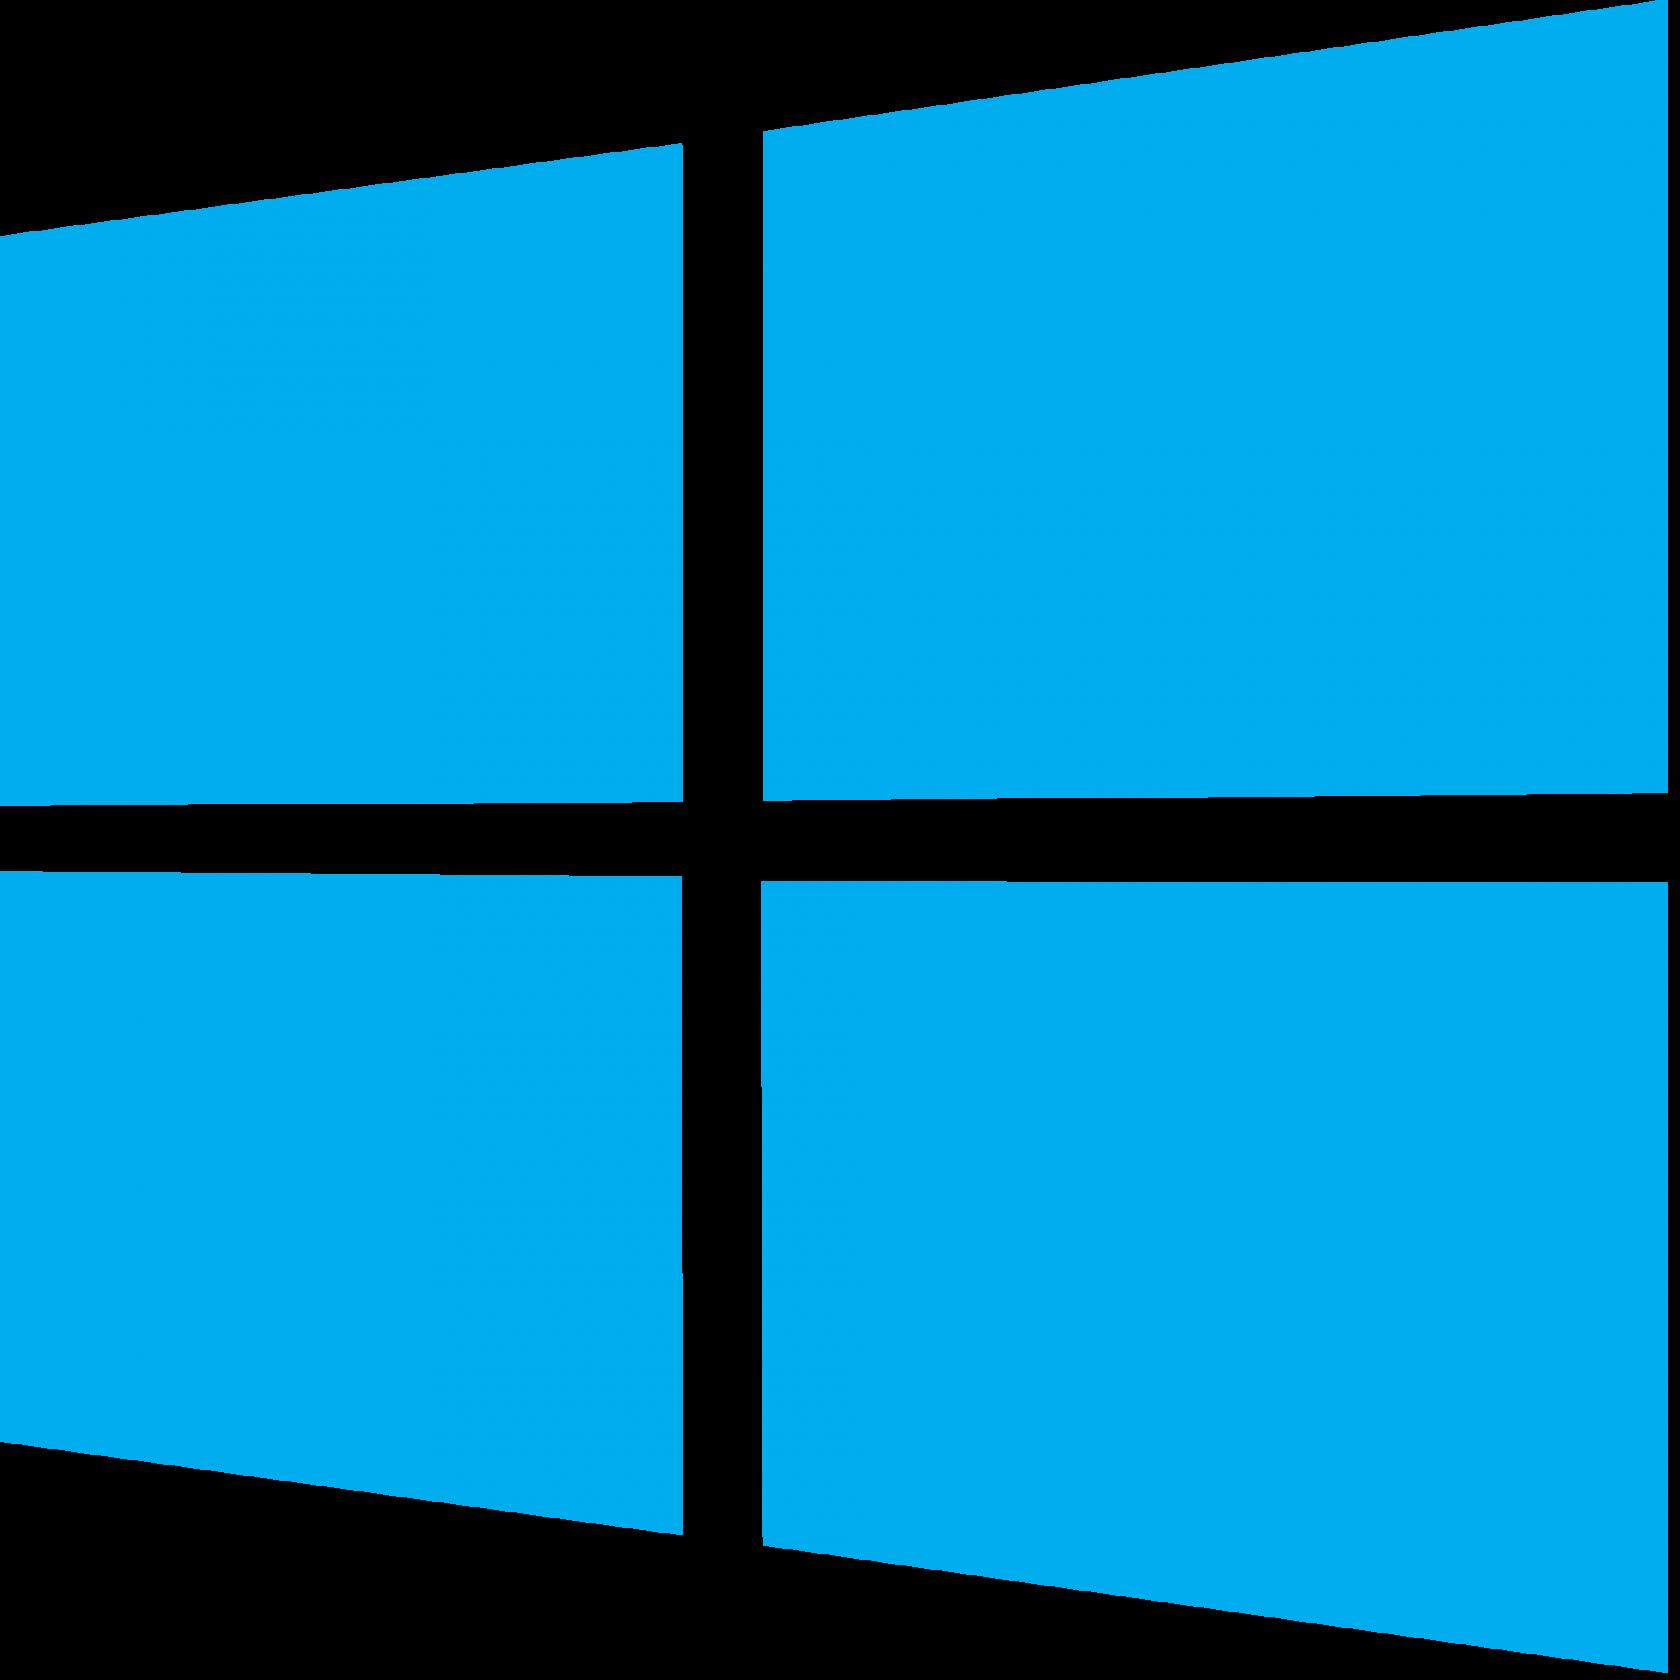 Microsoft Windows 10 Creators update, последняя редакция операционной системы